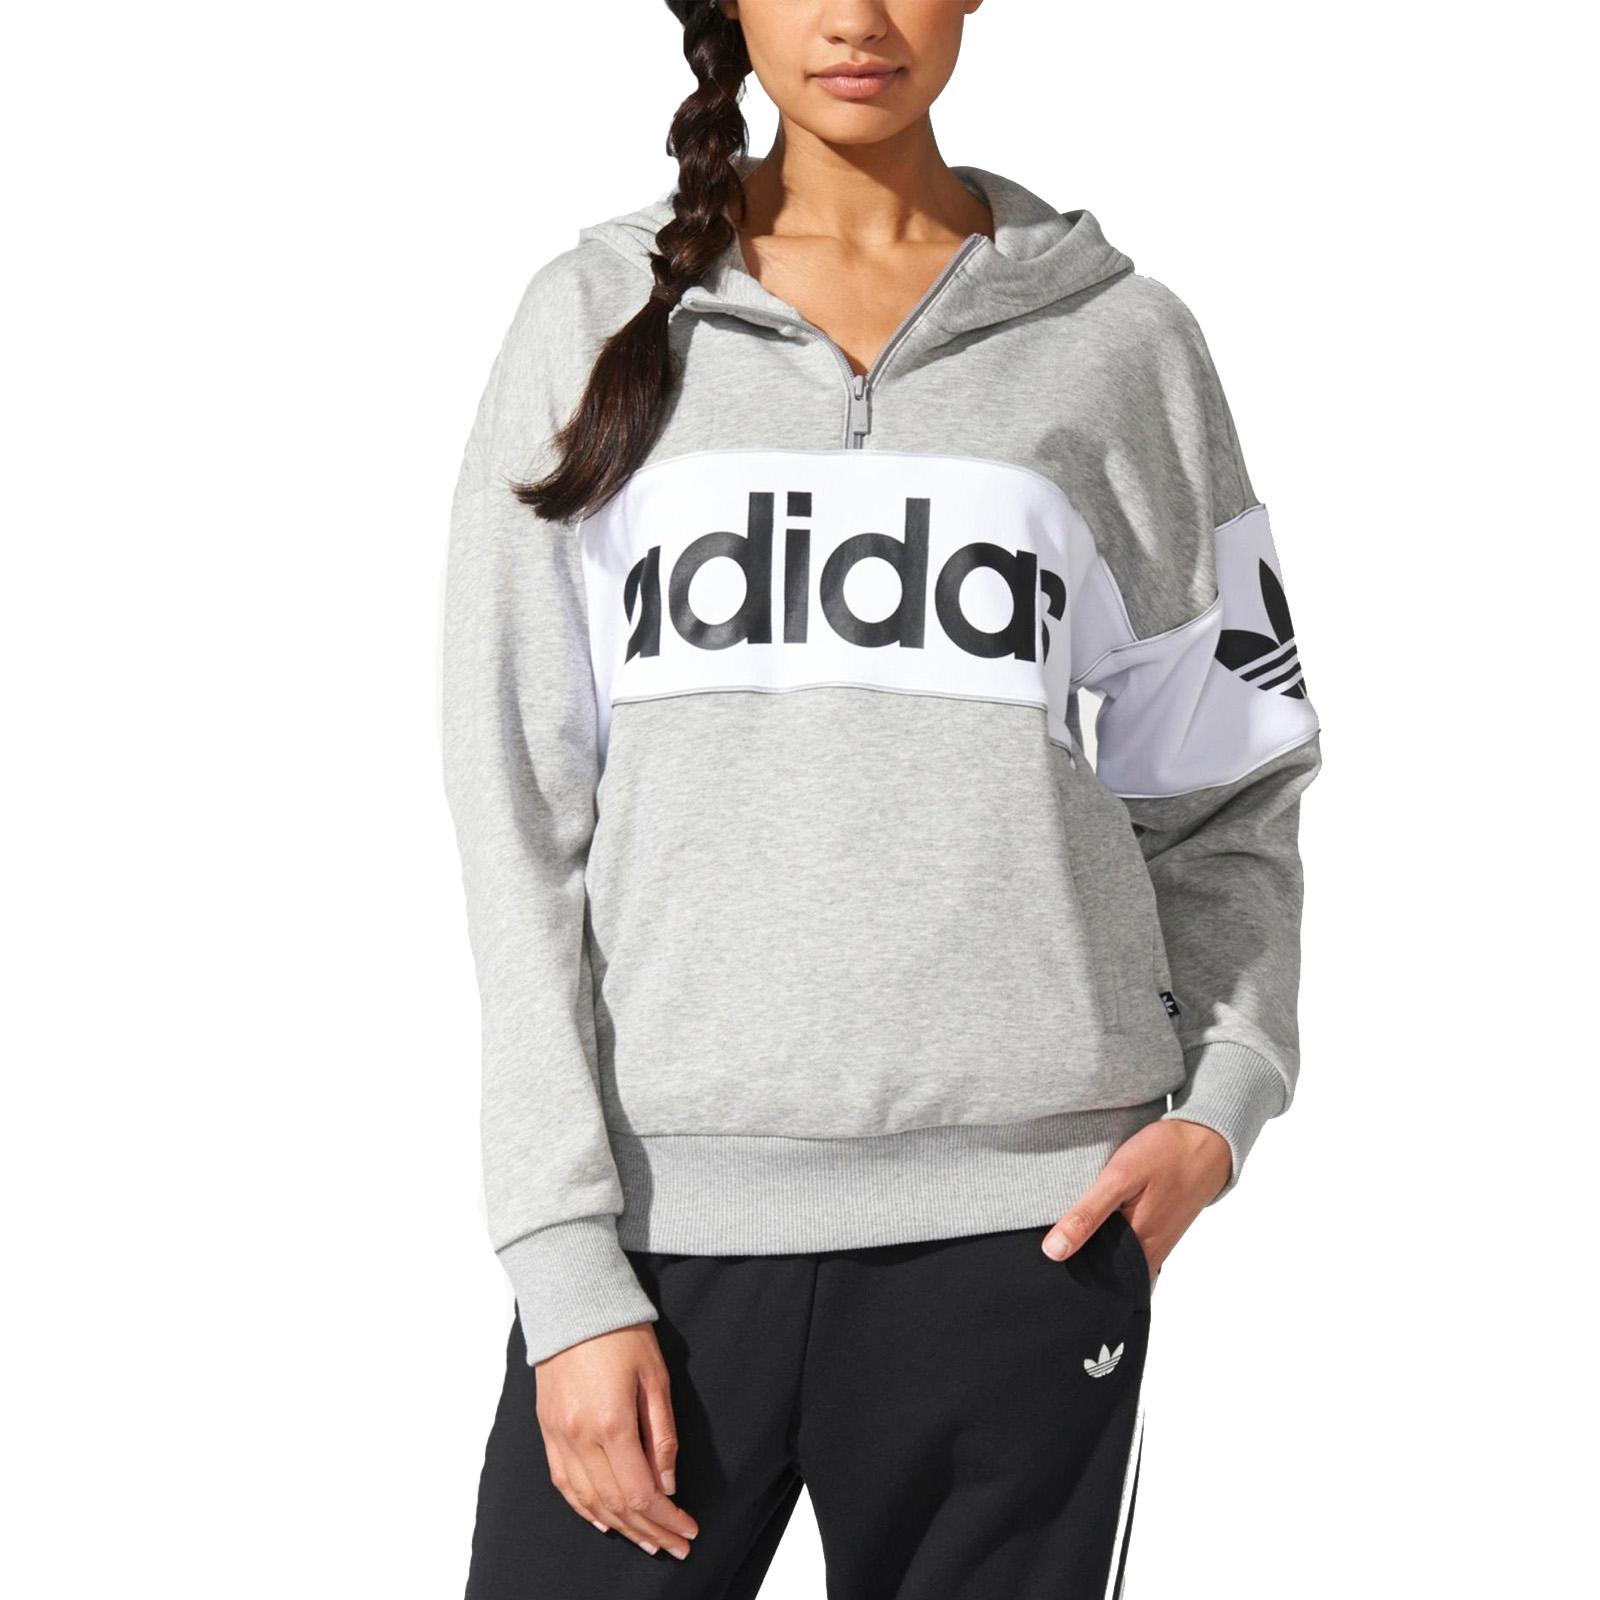 ... where to buy adidas originals grey hoodie womens 958d0 9ad73 086f3a00b6